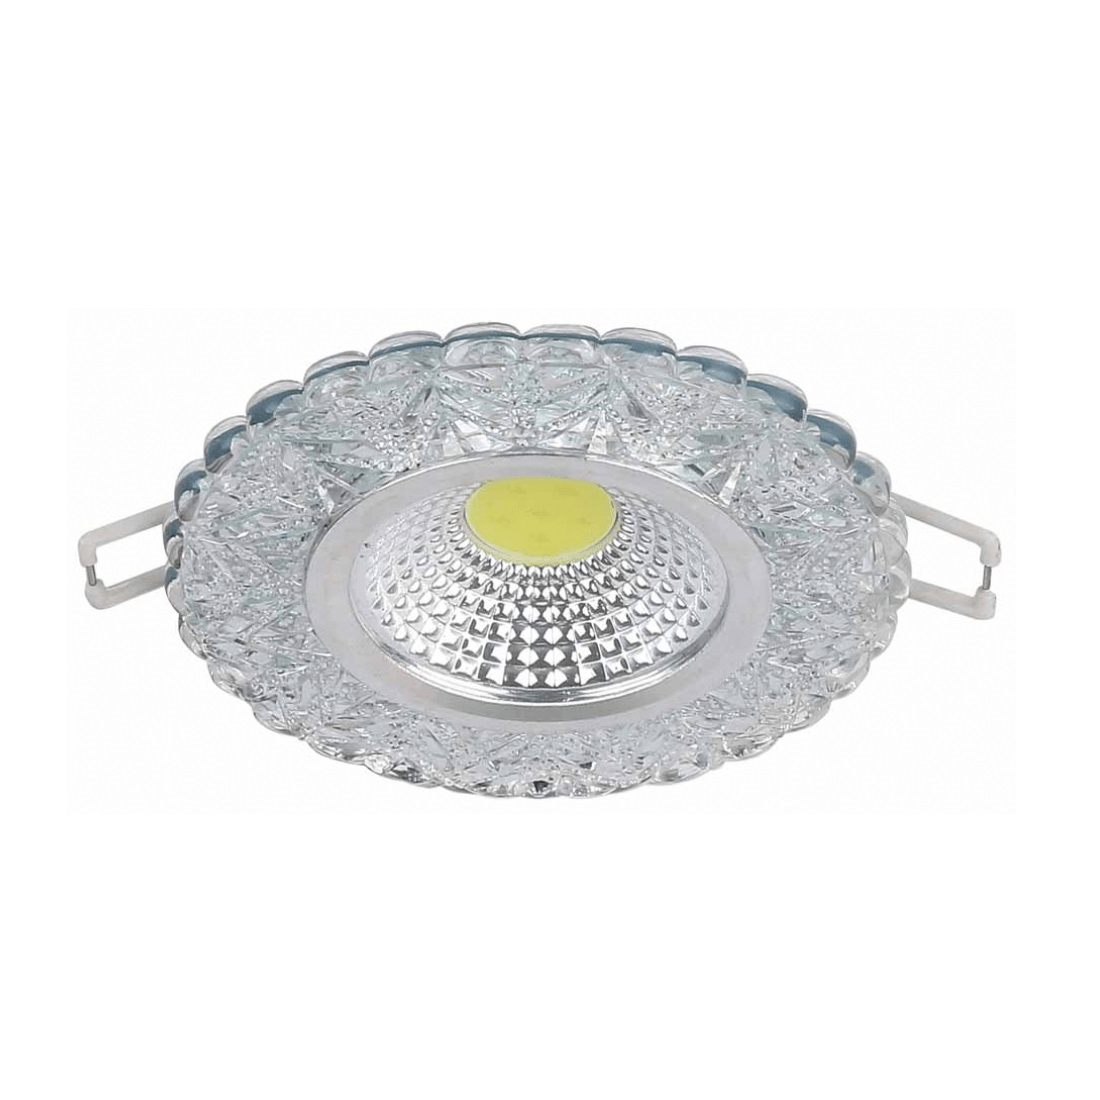 K2 GLOBAL KKS152 - 5 Watt Kristal LED Spot